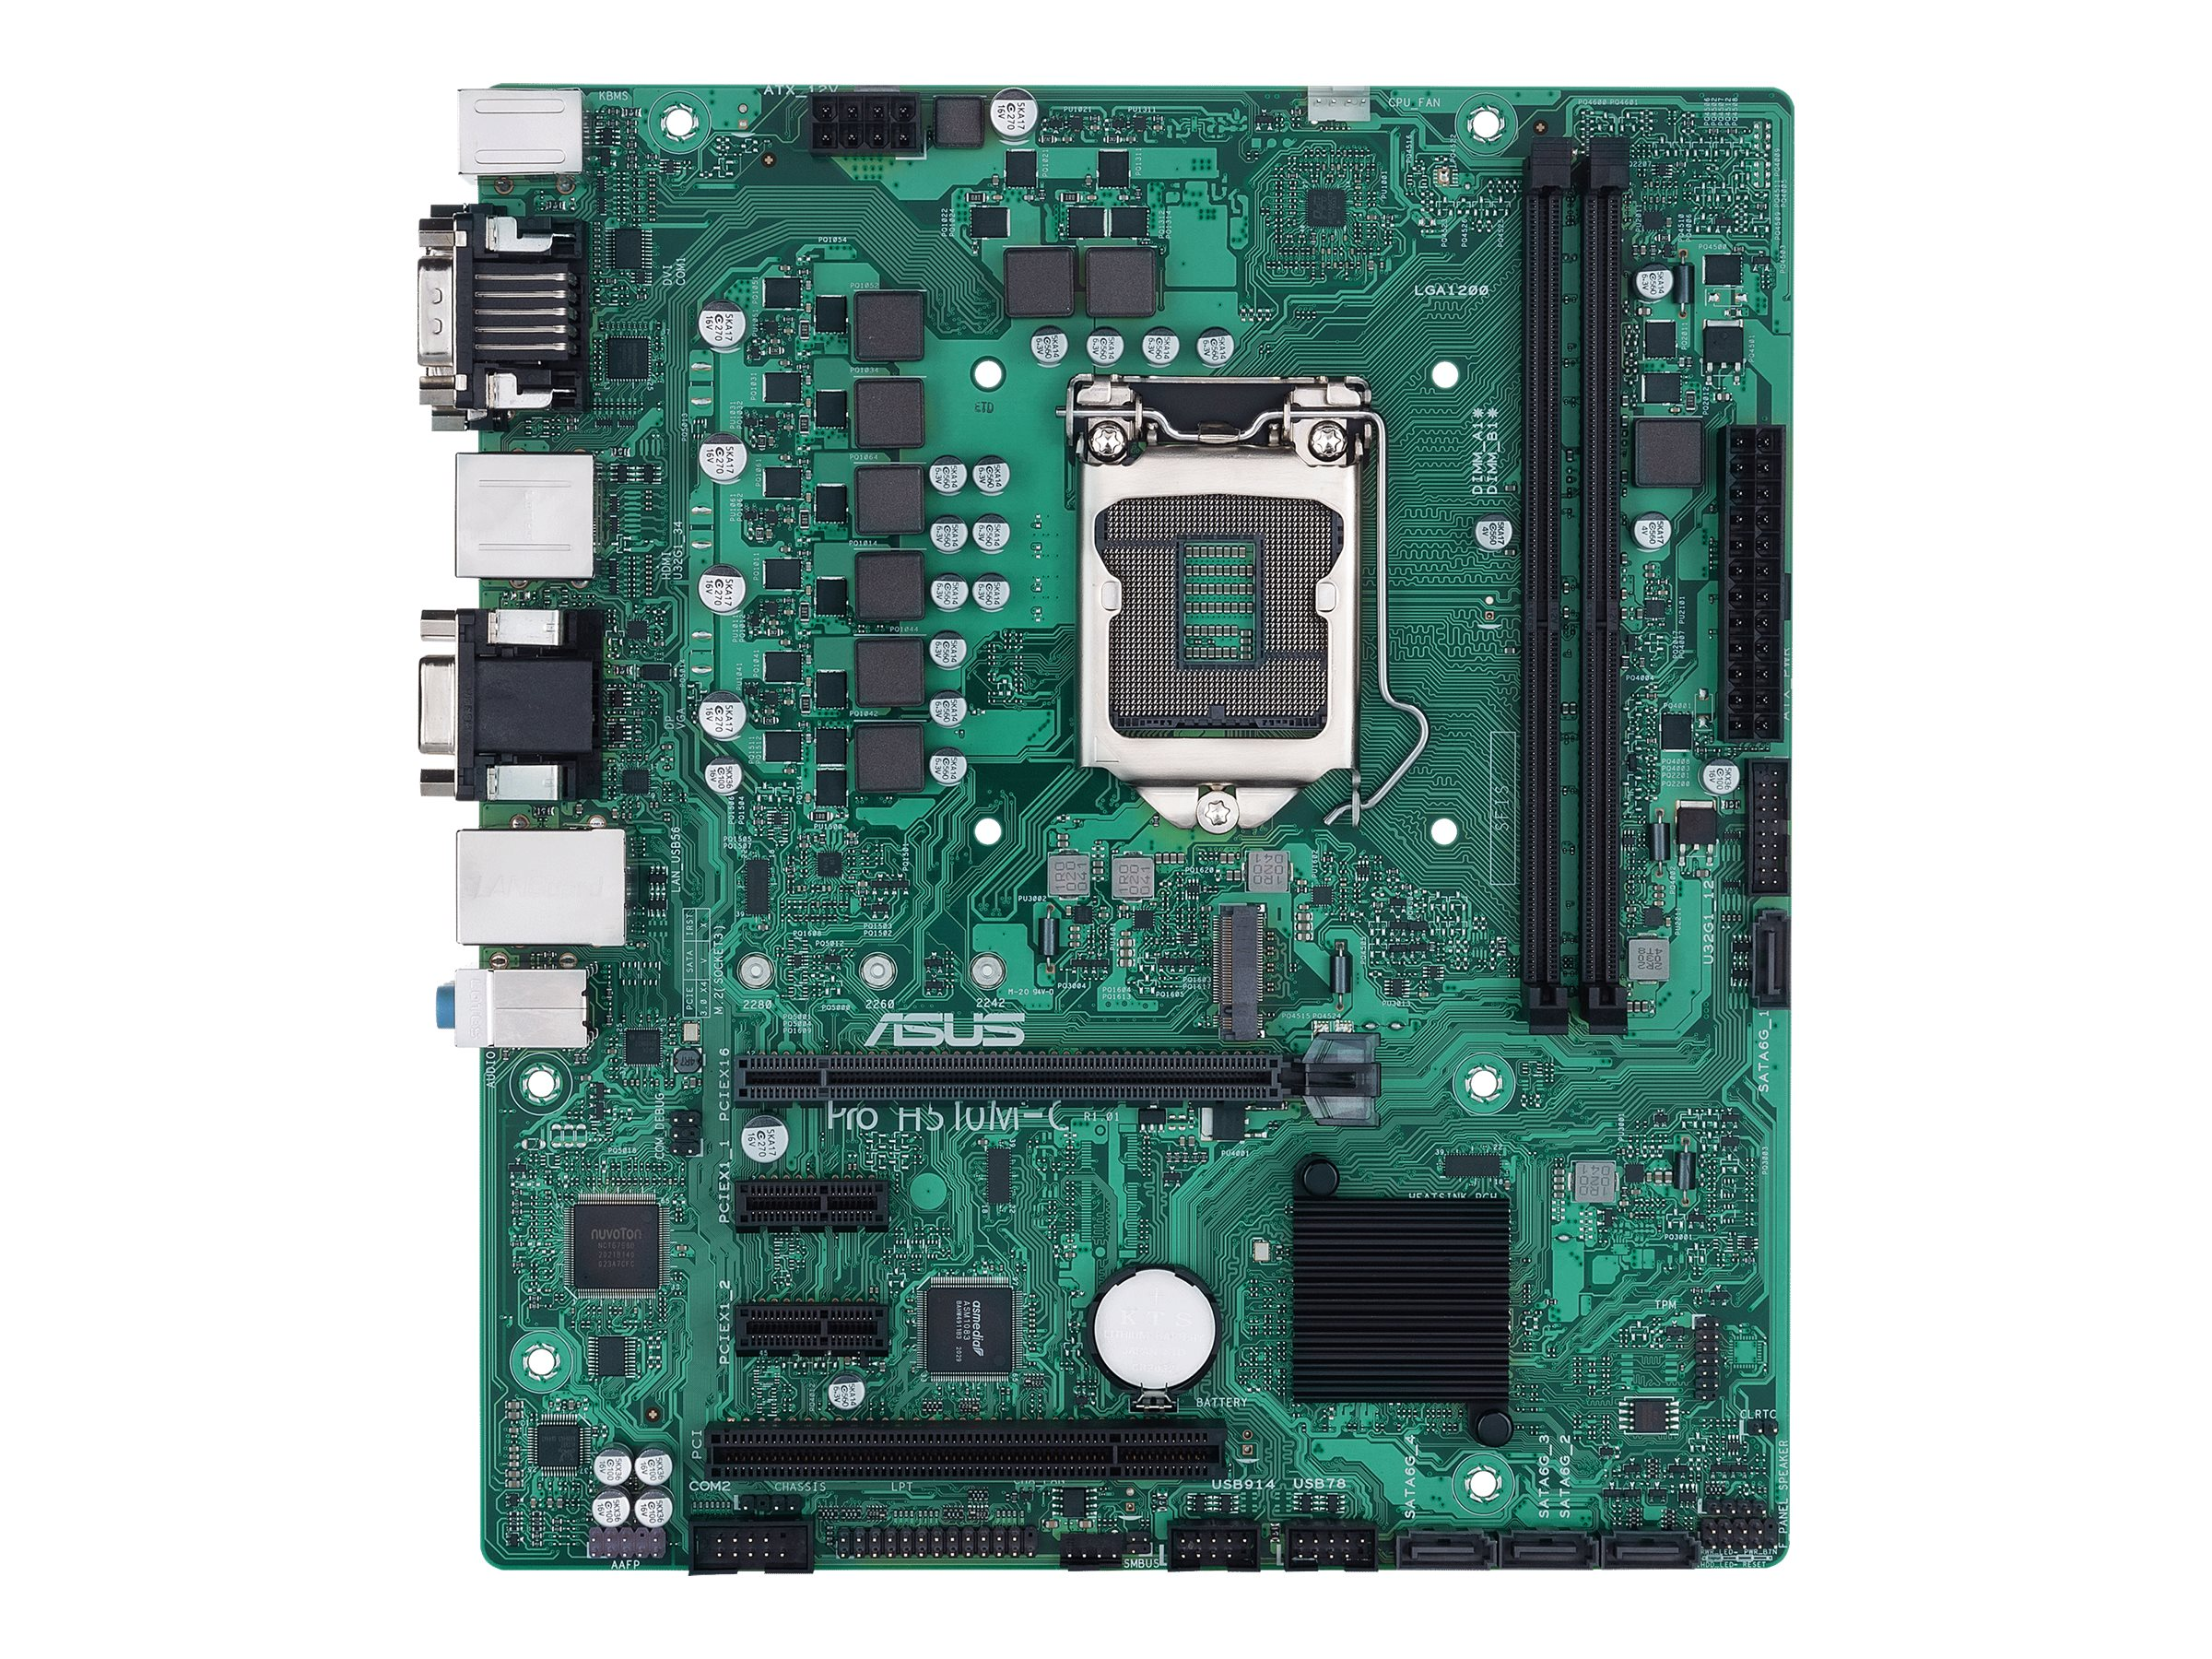 Vorschau: ASUS Pro H510M-C/CSM - Motherboard - micro ATX - LGA1200-Sockel - H510 - USB 3.2 Gen 1 - Gigabit LAN - Onboard-Grafik (CPU erforderlich)